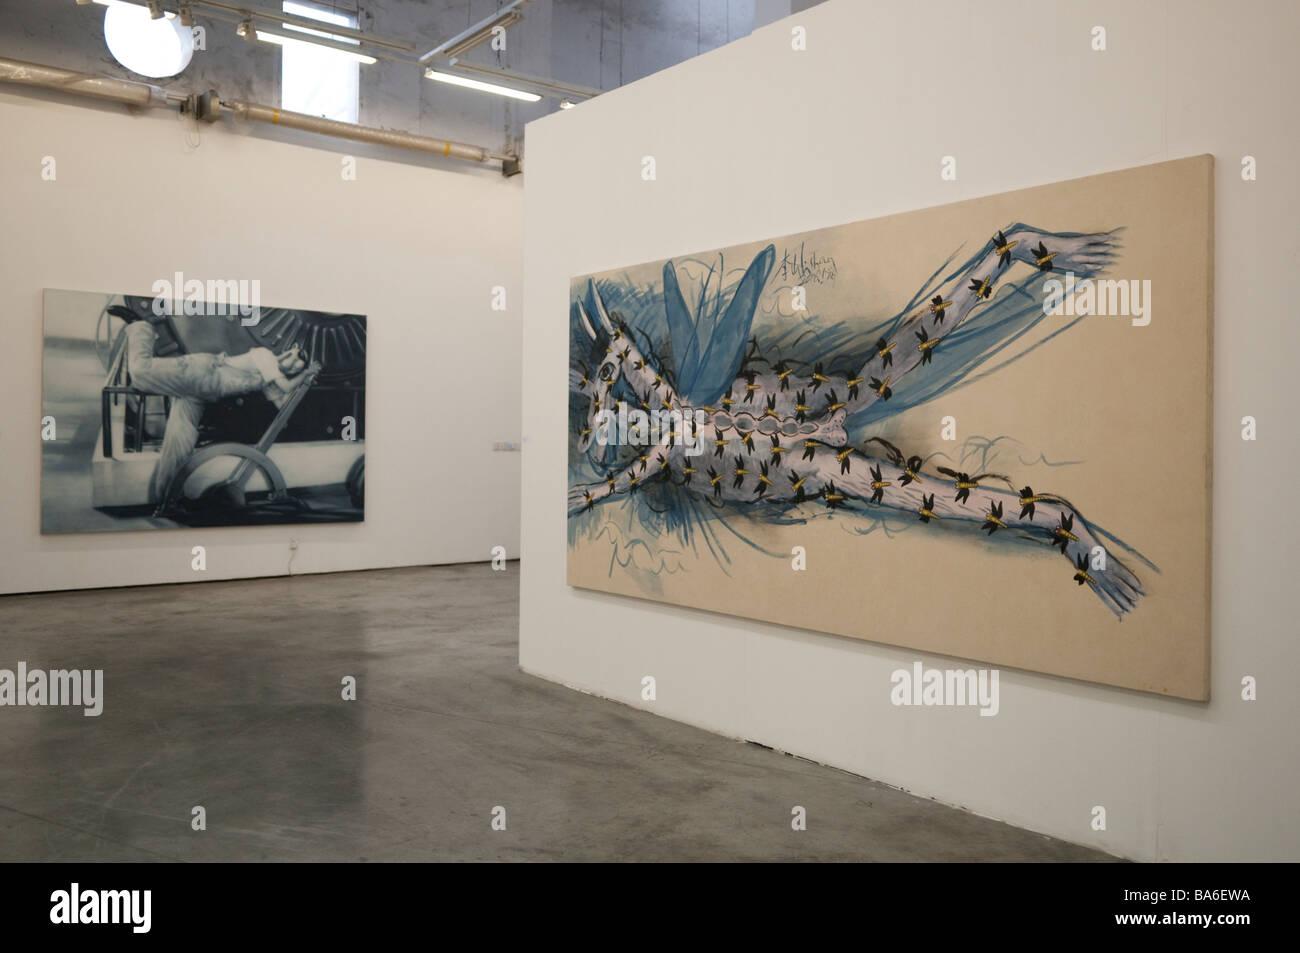 Art Gallery at Moganshan Shanghai China 2009 - Stock Image